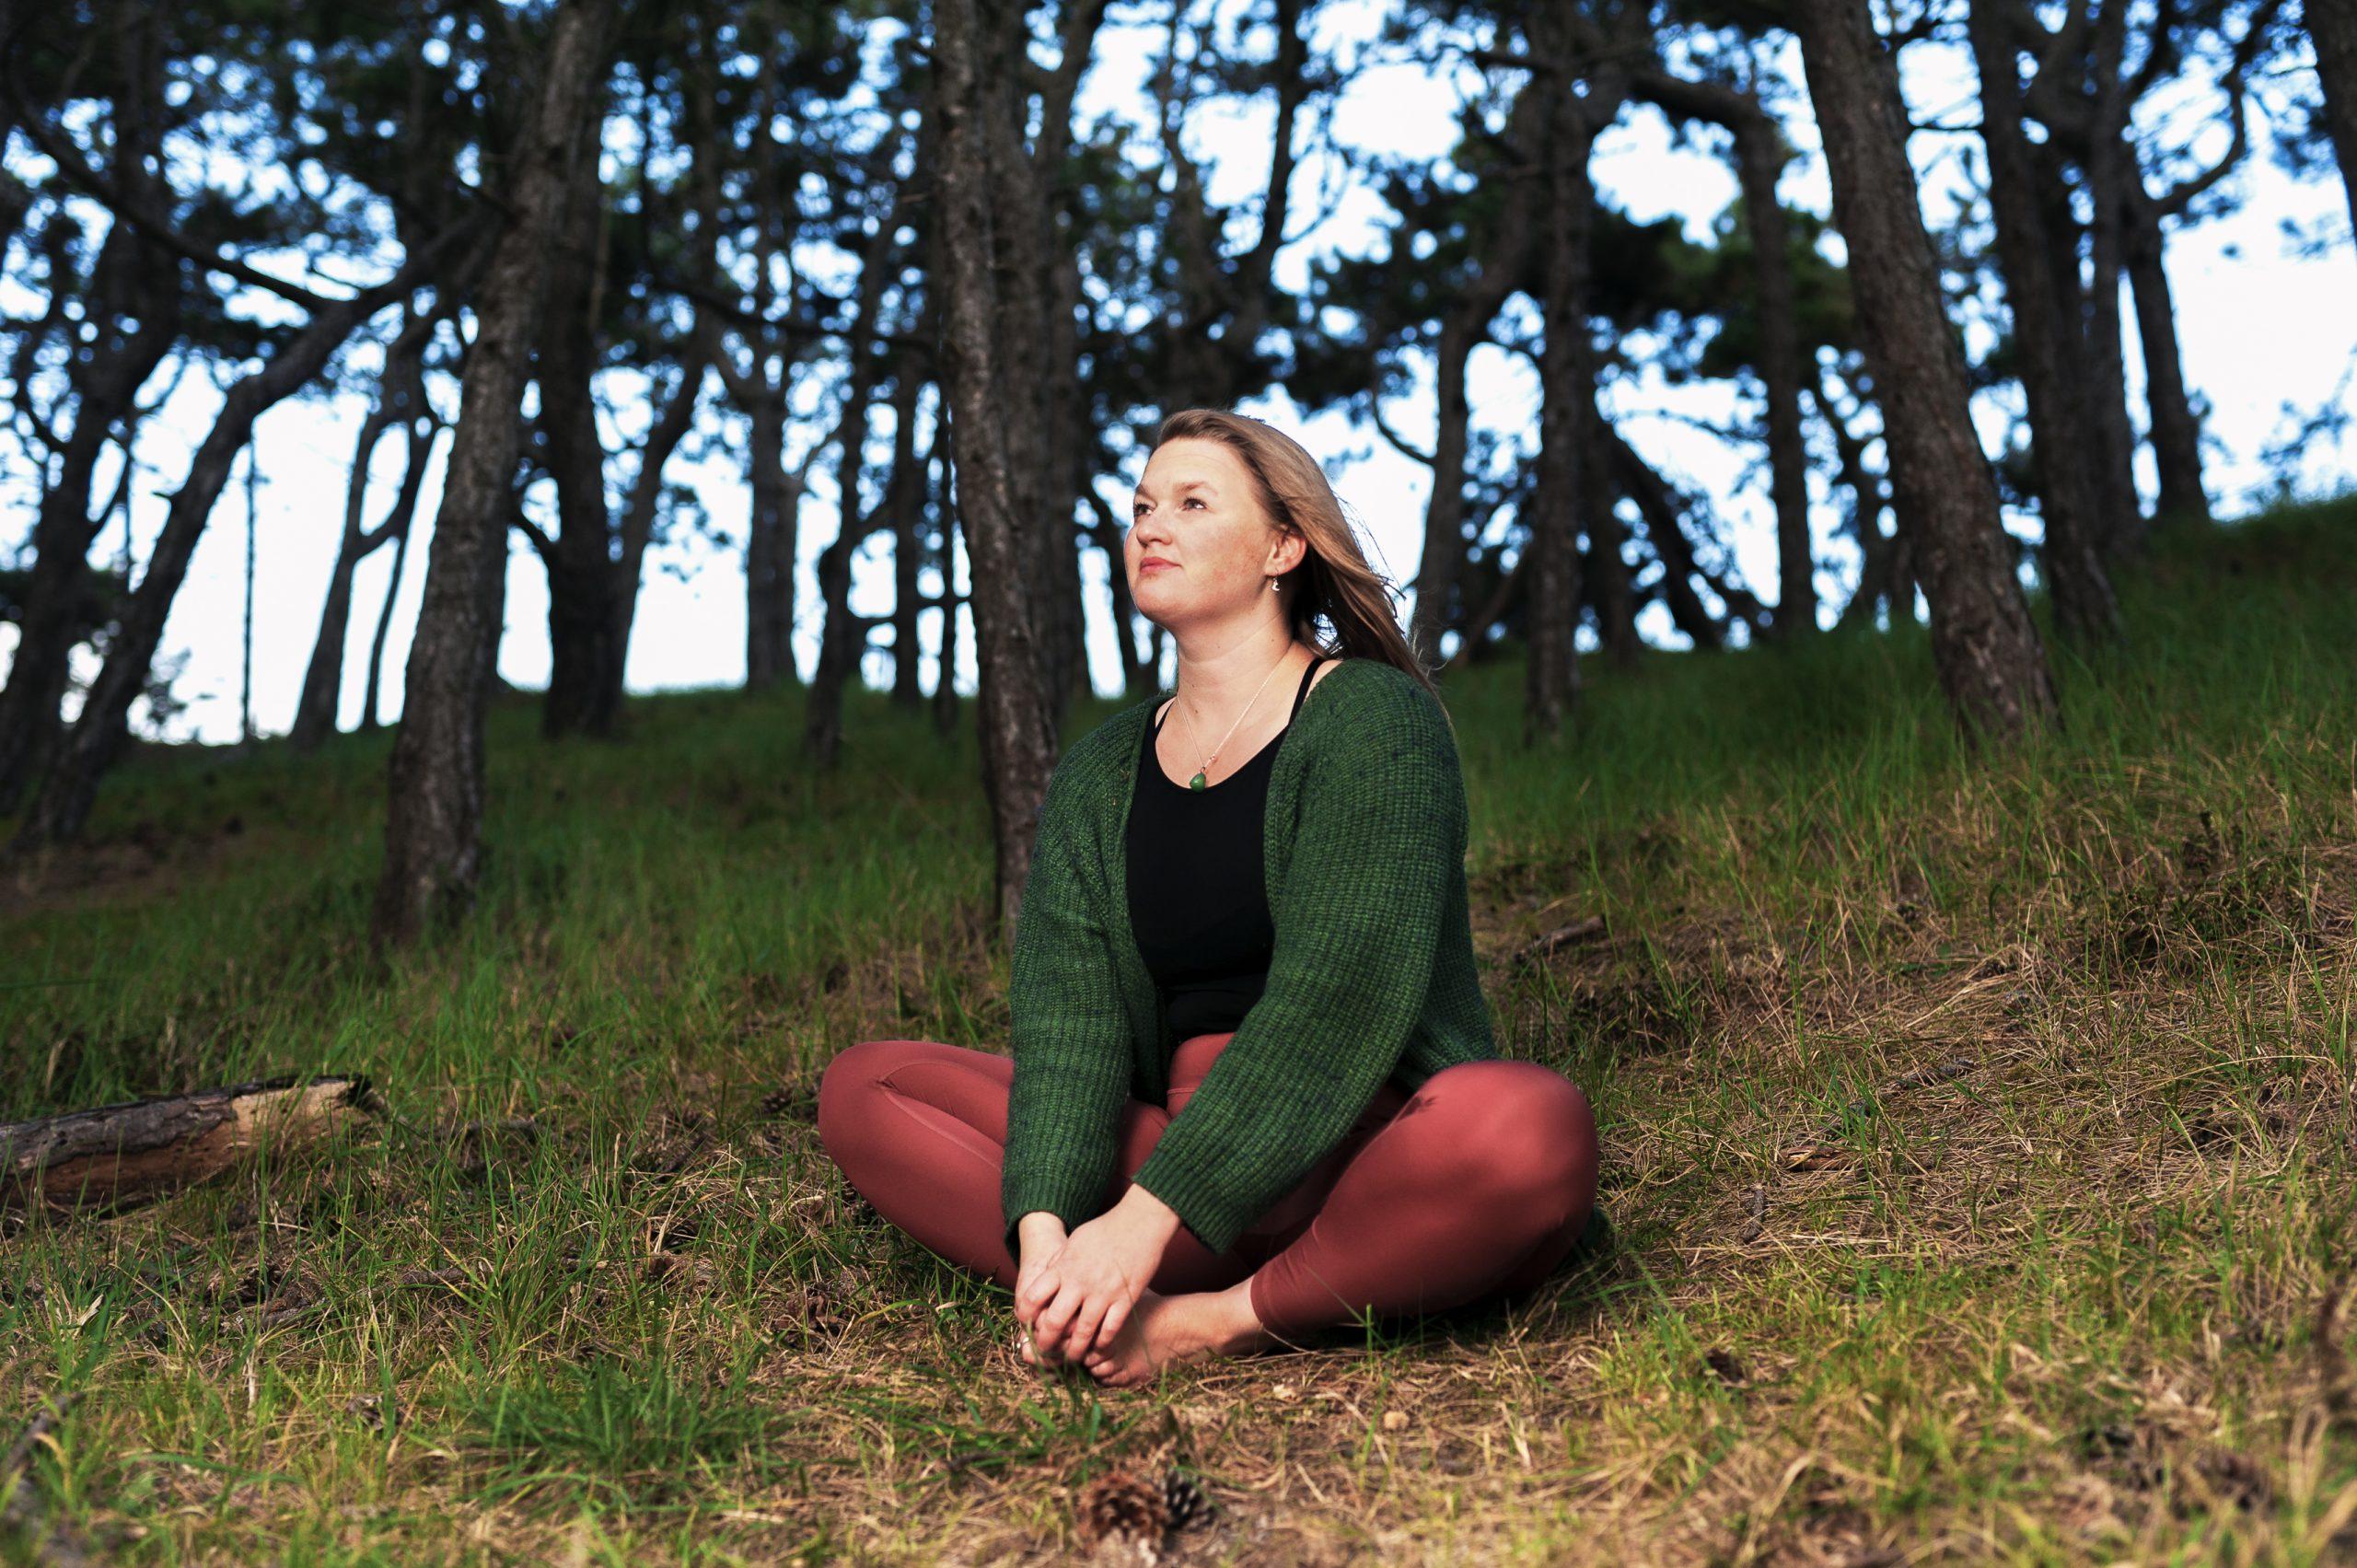 Protocol verantwoord yoga les volgen